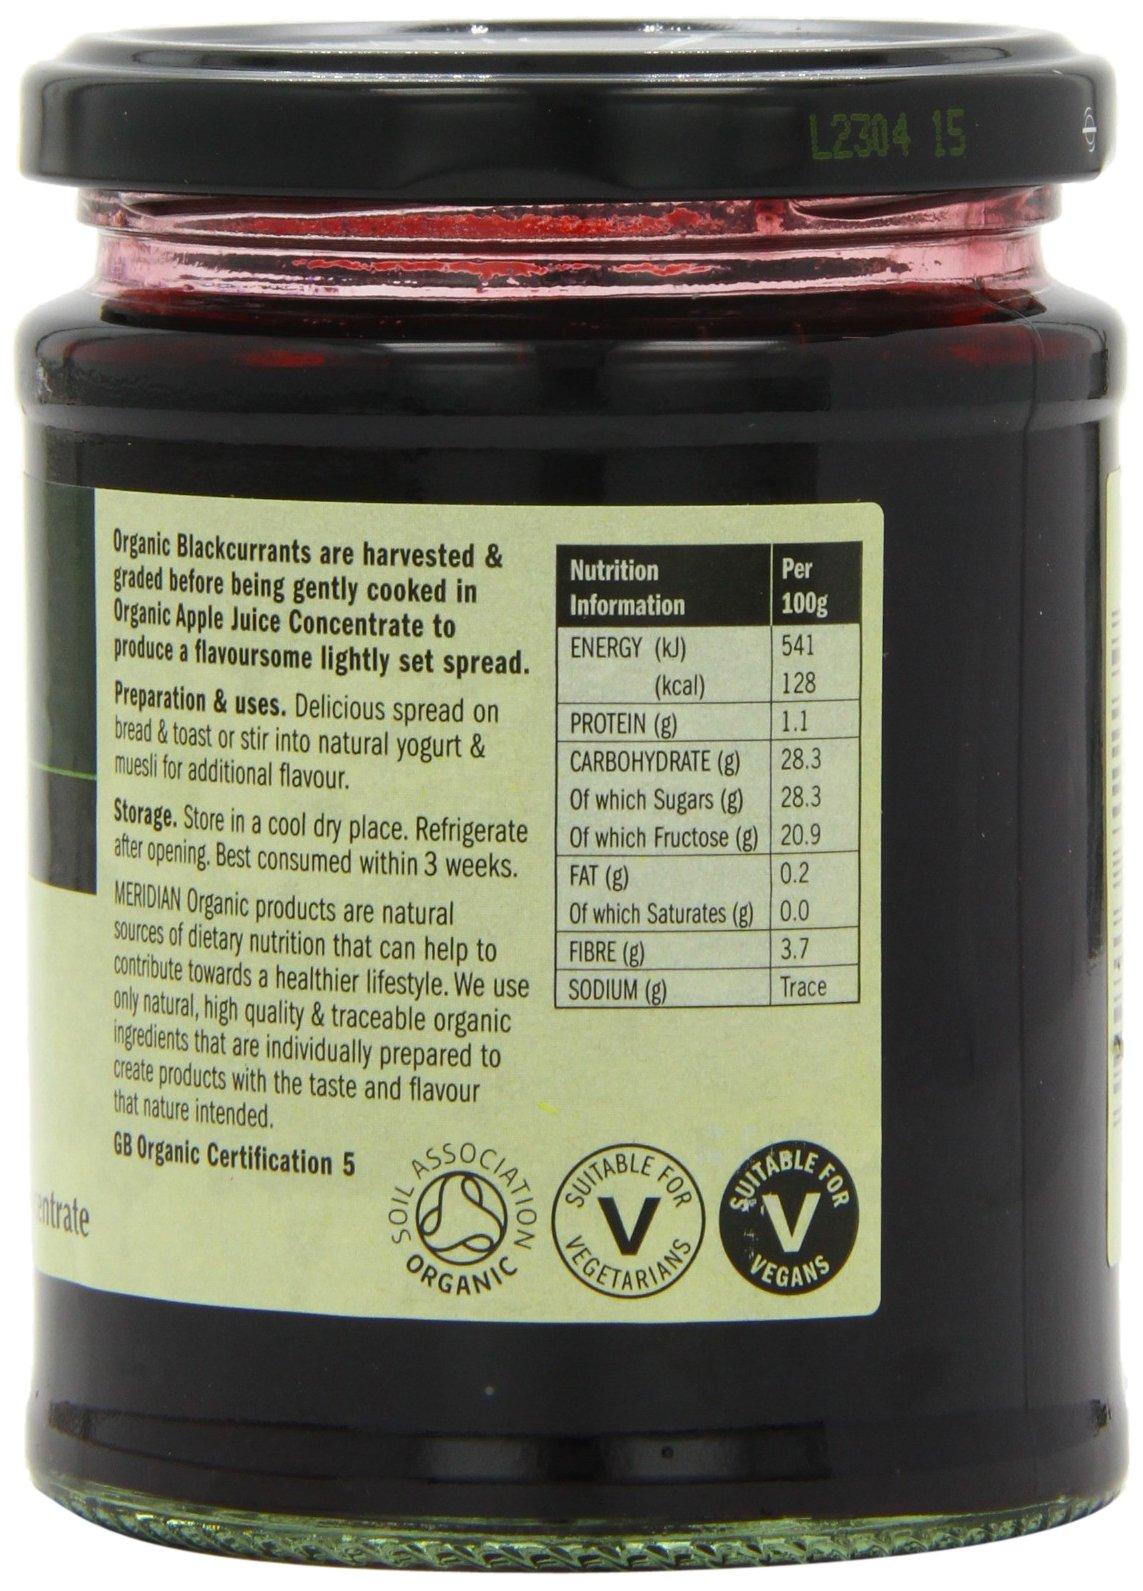 Meridian Organic Blackcurrant Fruit Spread 284 g (Pack of 6) by Meridian (Image #4)